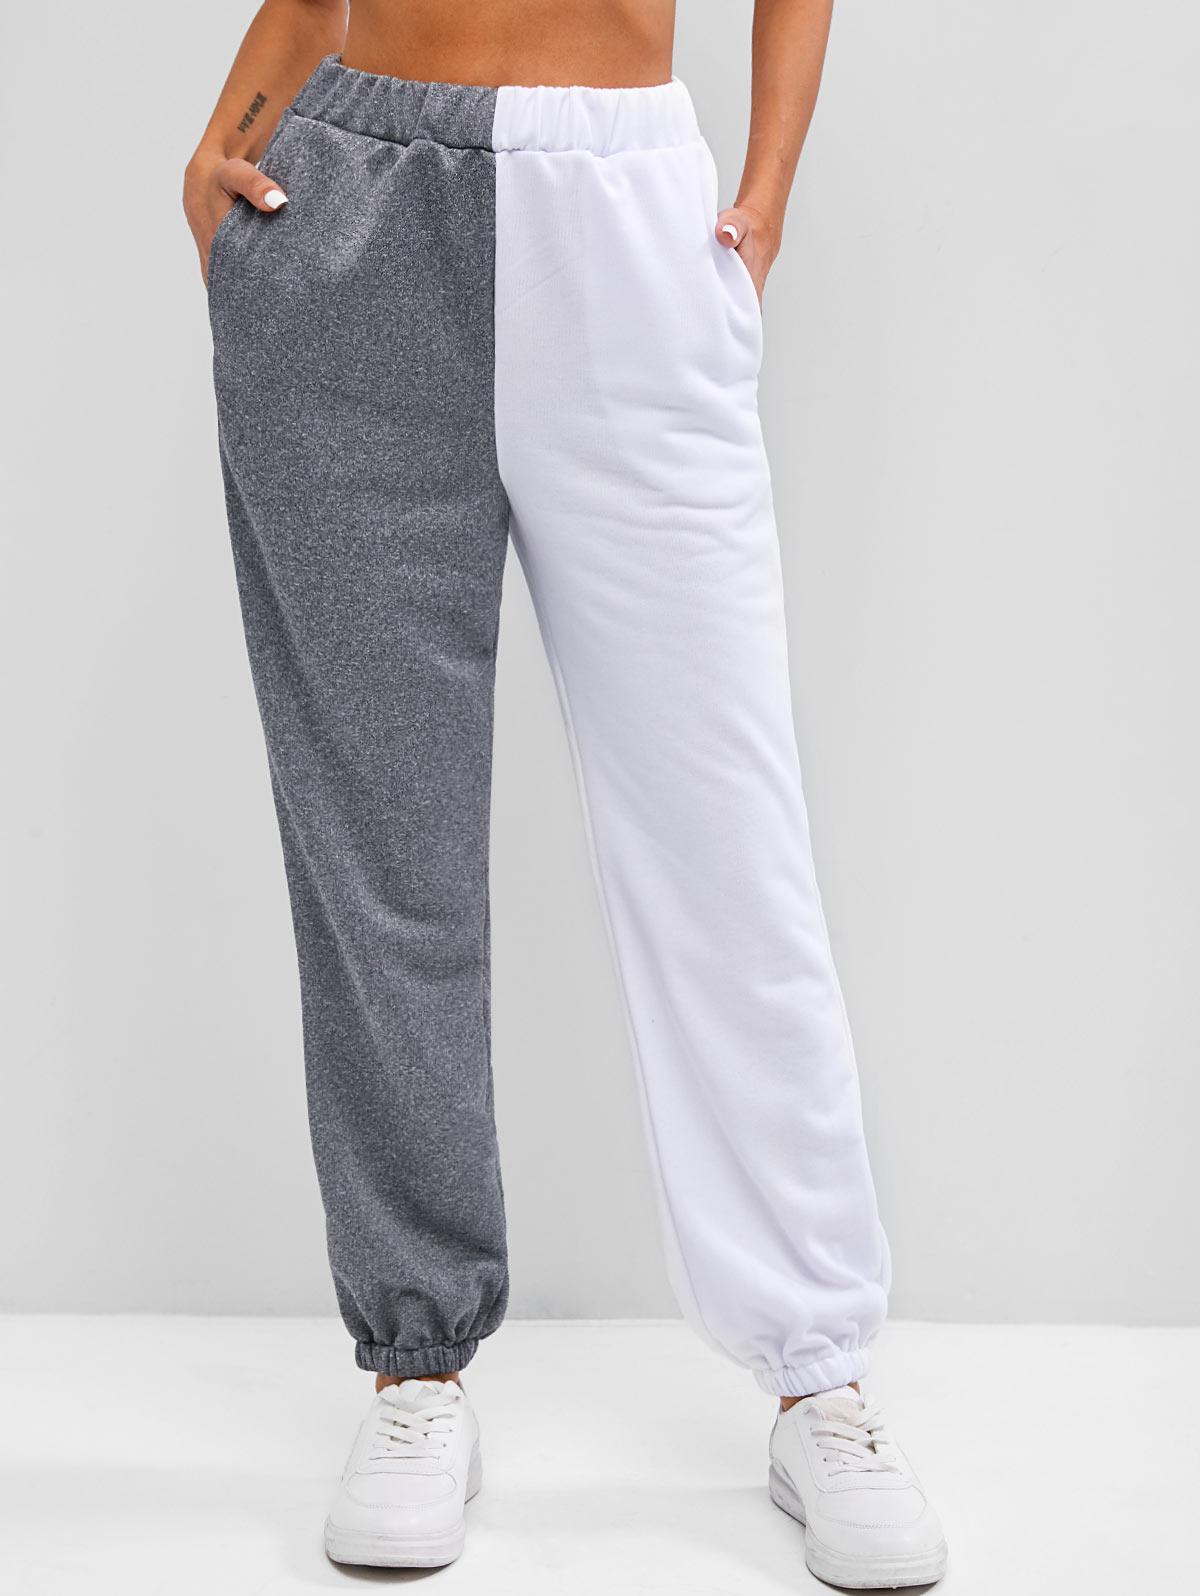 High Waisted Contrast Jogger Sweatpants